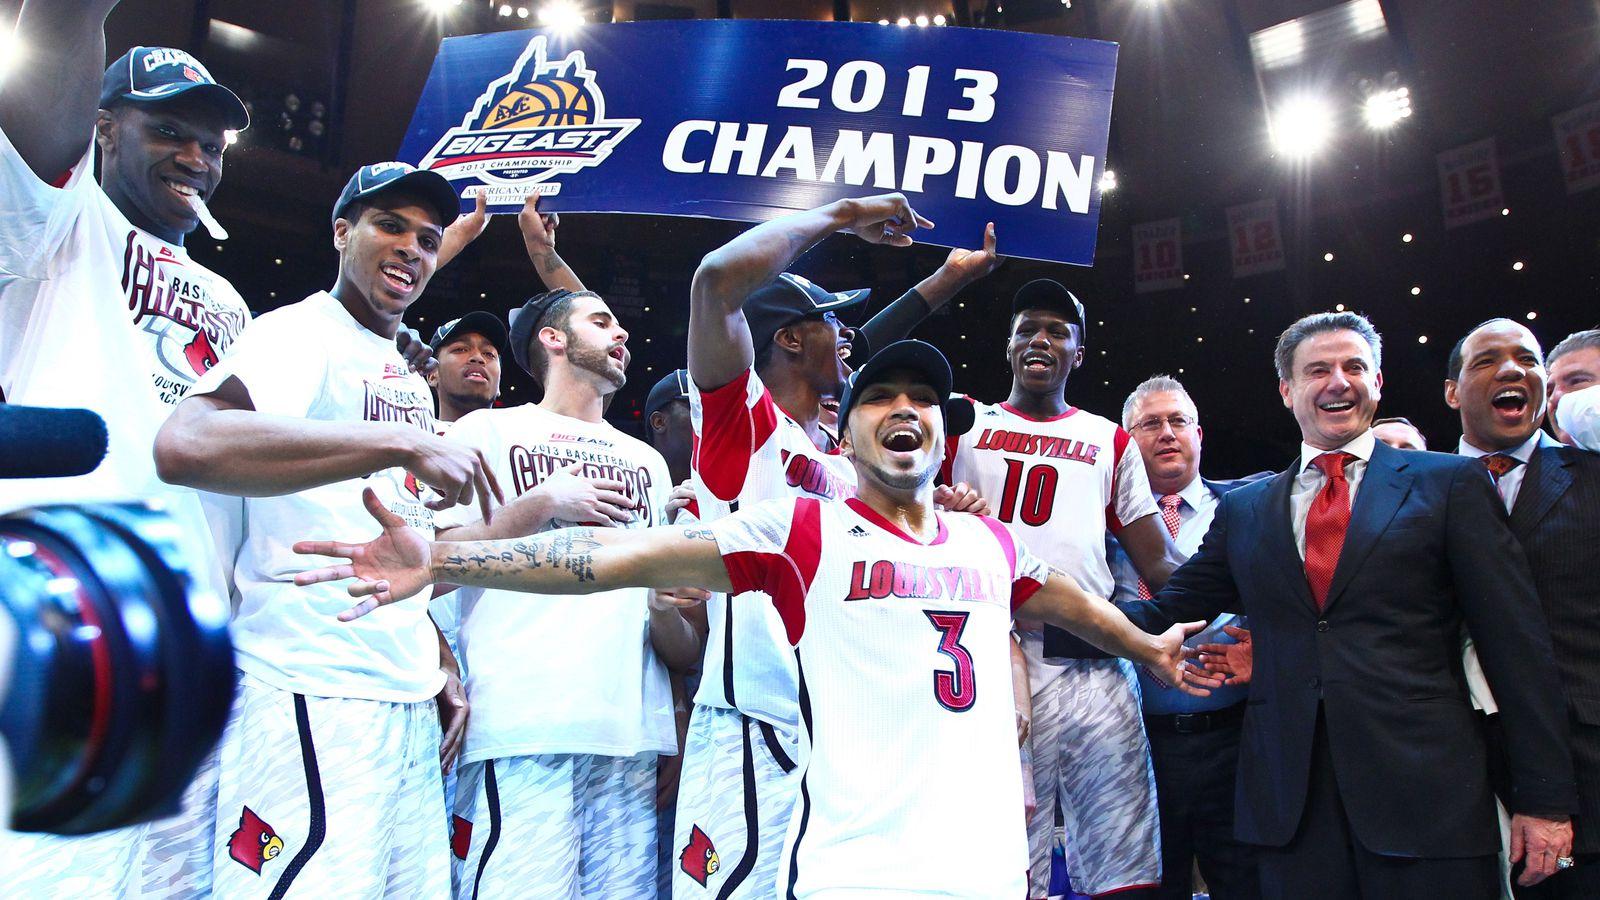 Ncaa Bracketology Kentucky Is No 1 Seed Uc Bearcats No: NCAA Bracket Predictions 2013: Louisville Claims First